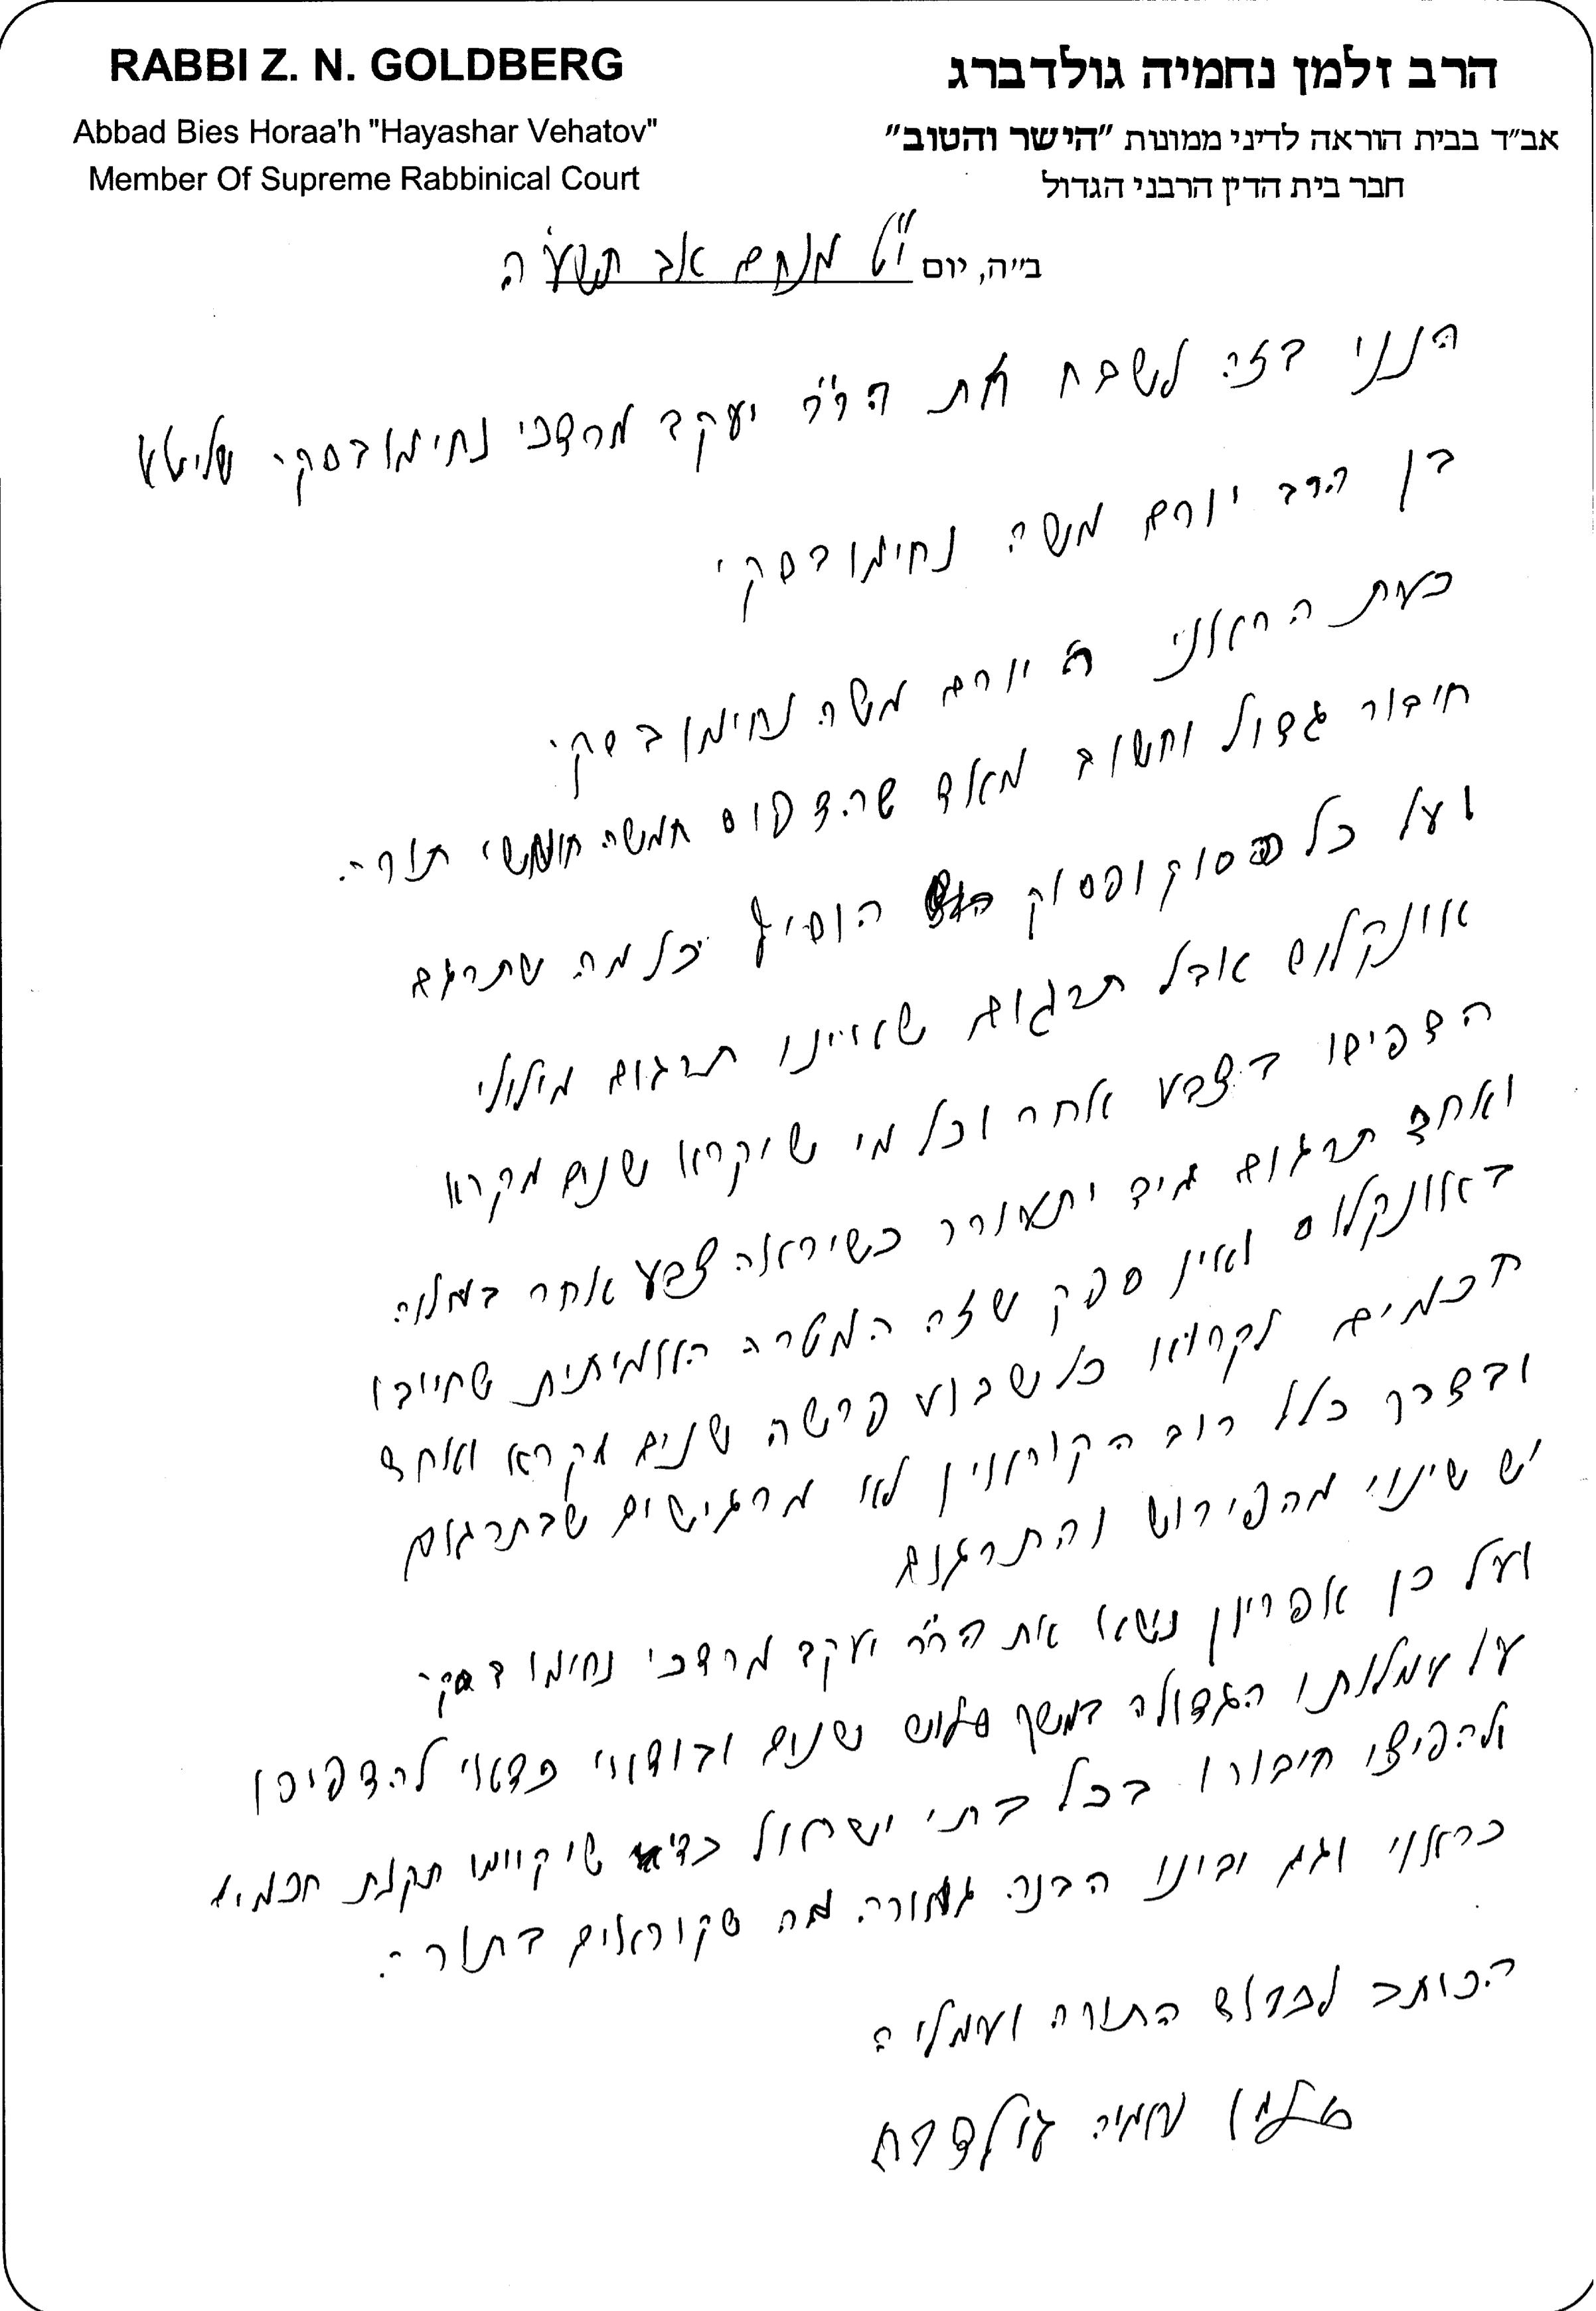 00 AHAVAECHAD.ORG Haskamoth HaGaon Rabbi Zalman Nechemia Goldberg SHVMH